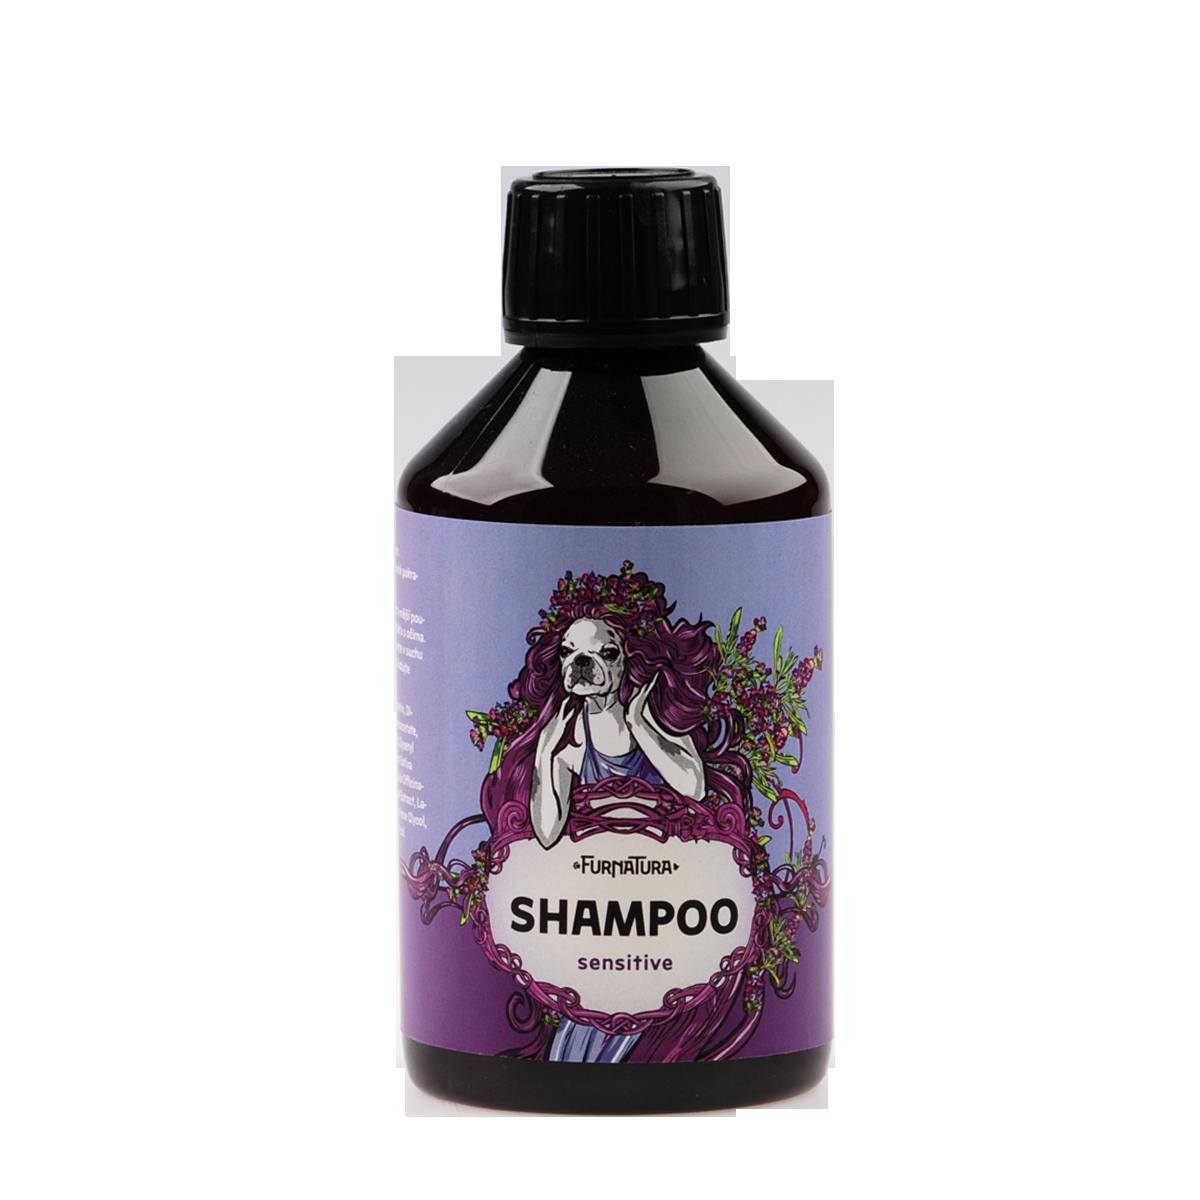 Furnatura šampon sensitive